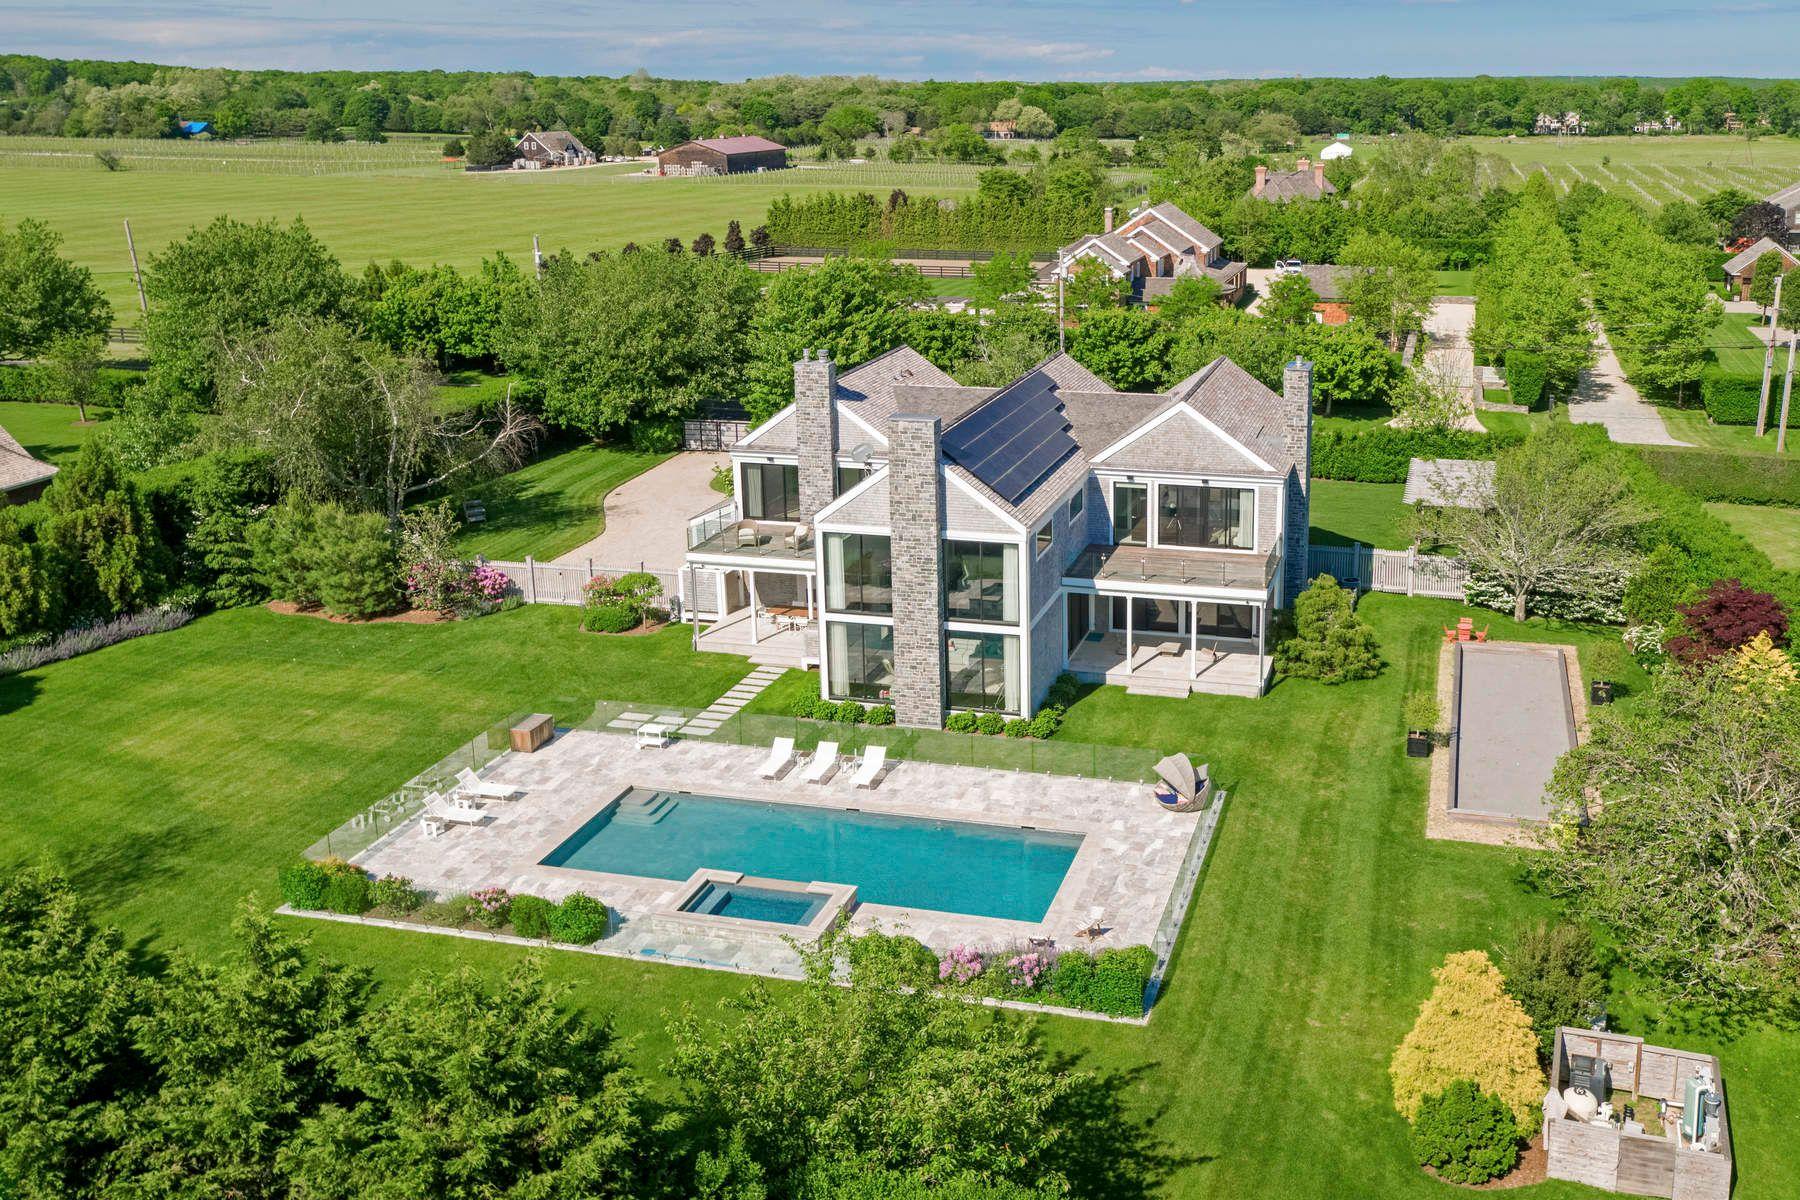 Single Family Home for Sale at Modern Barn Style On Lumber Lane 754 Lumber Lane Bridgehampton, New York 11932 United States